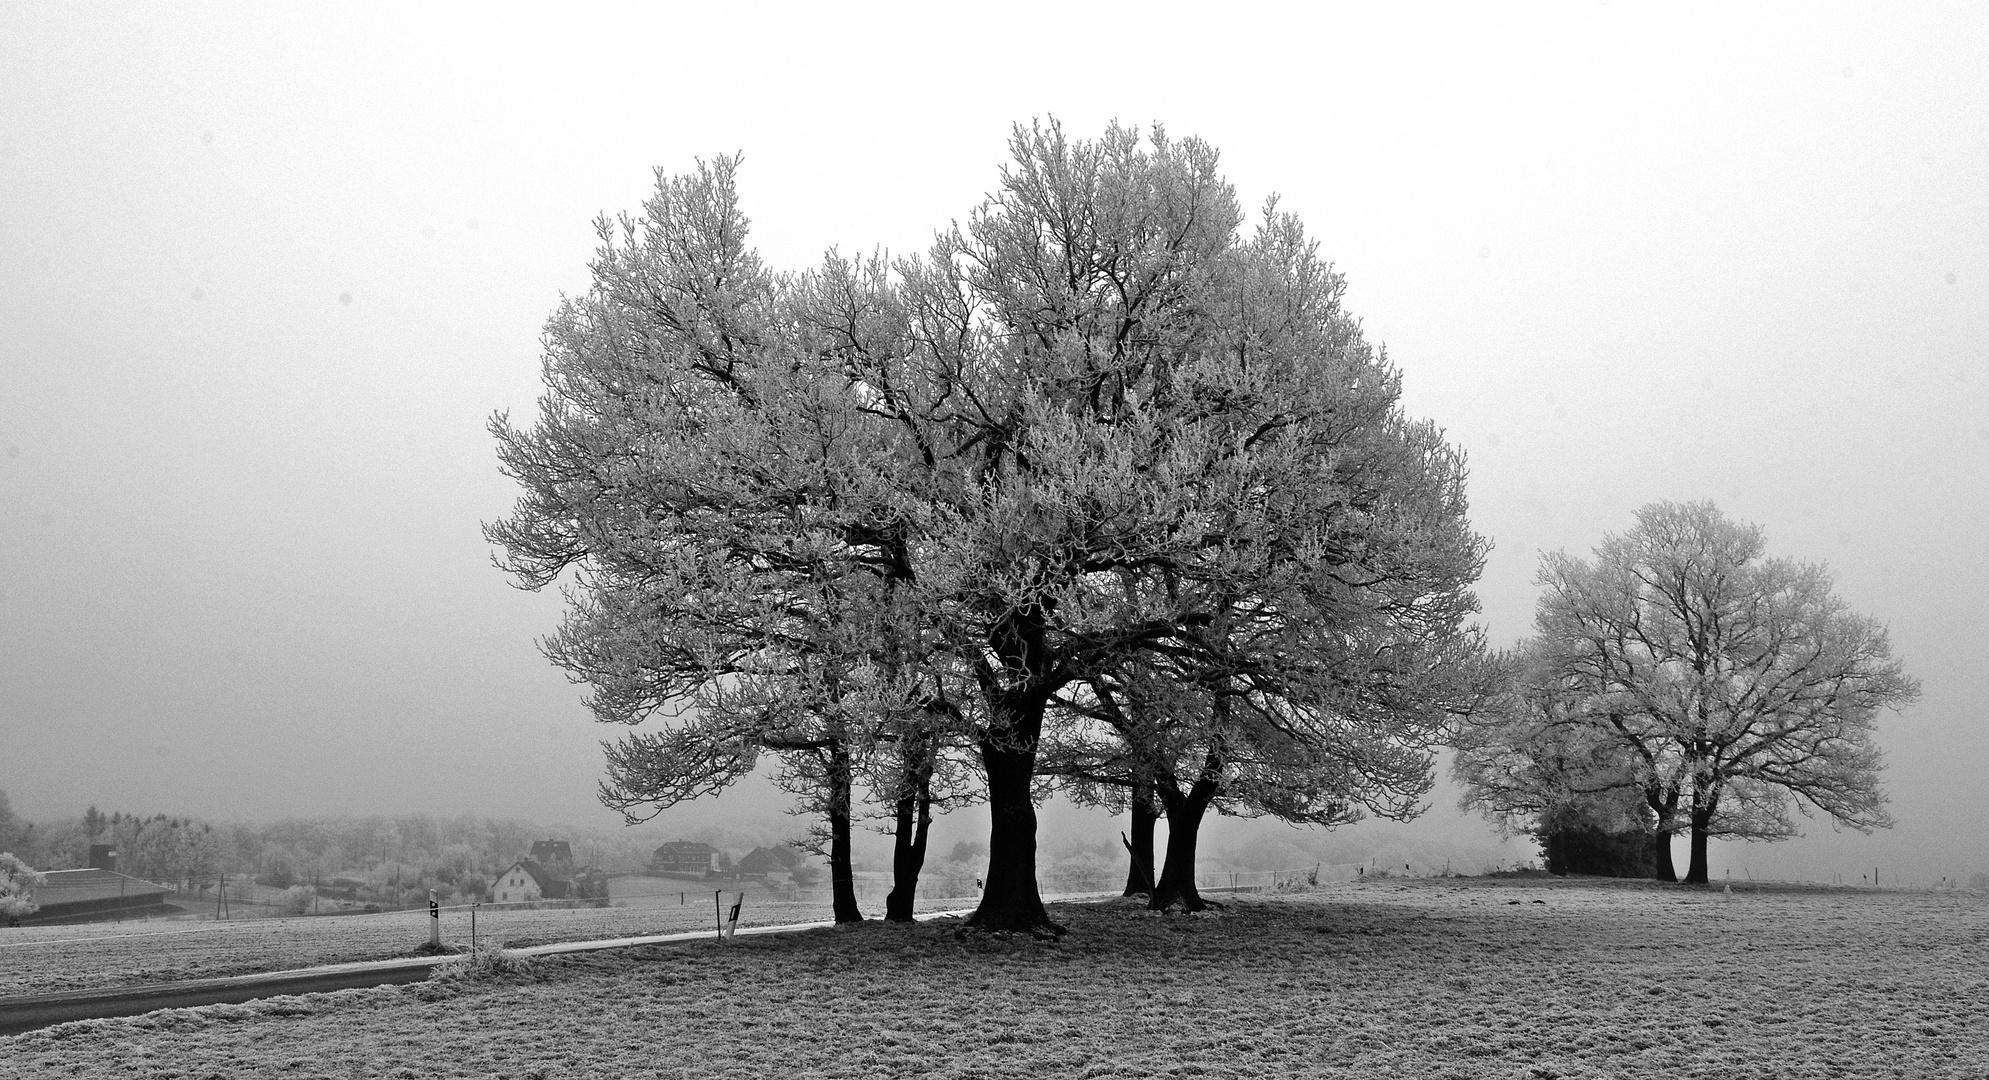 Nebel, minus 5, Rauhreif ...